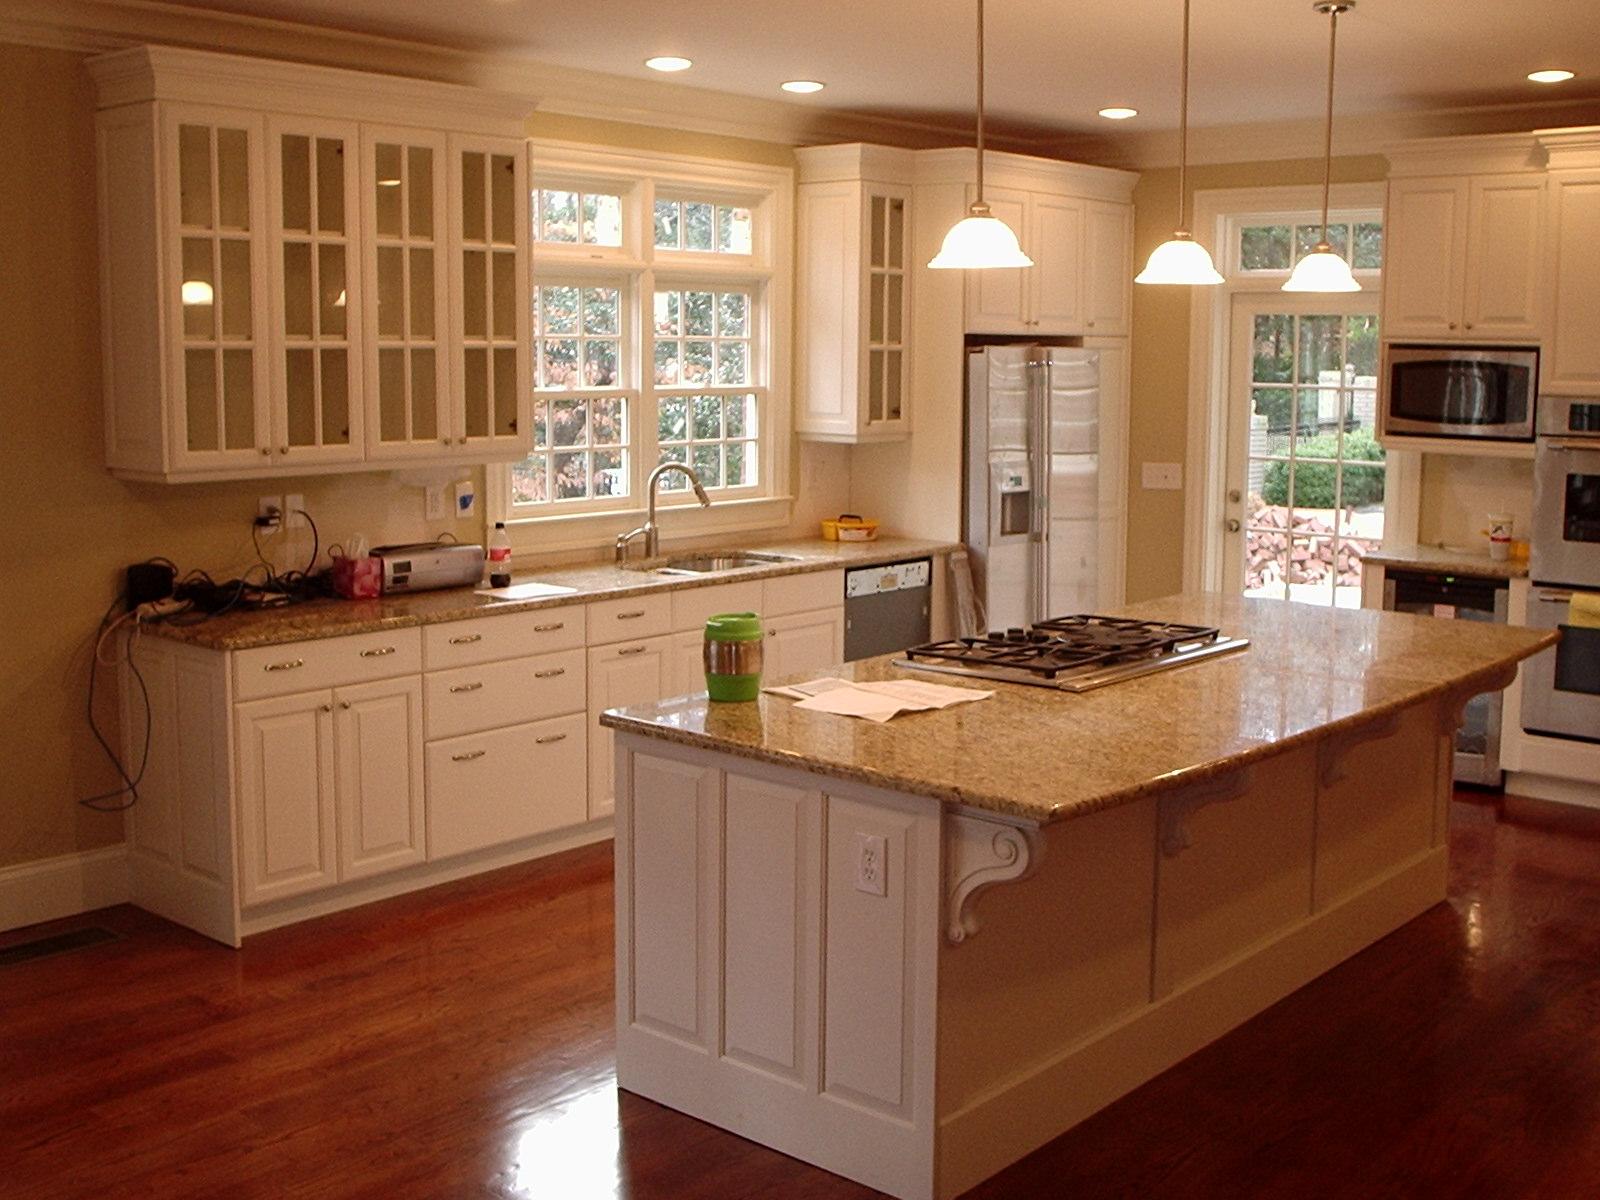 Blue kitchen appliances Photo - 4